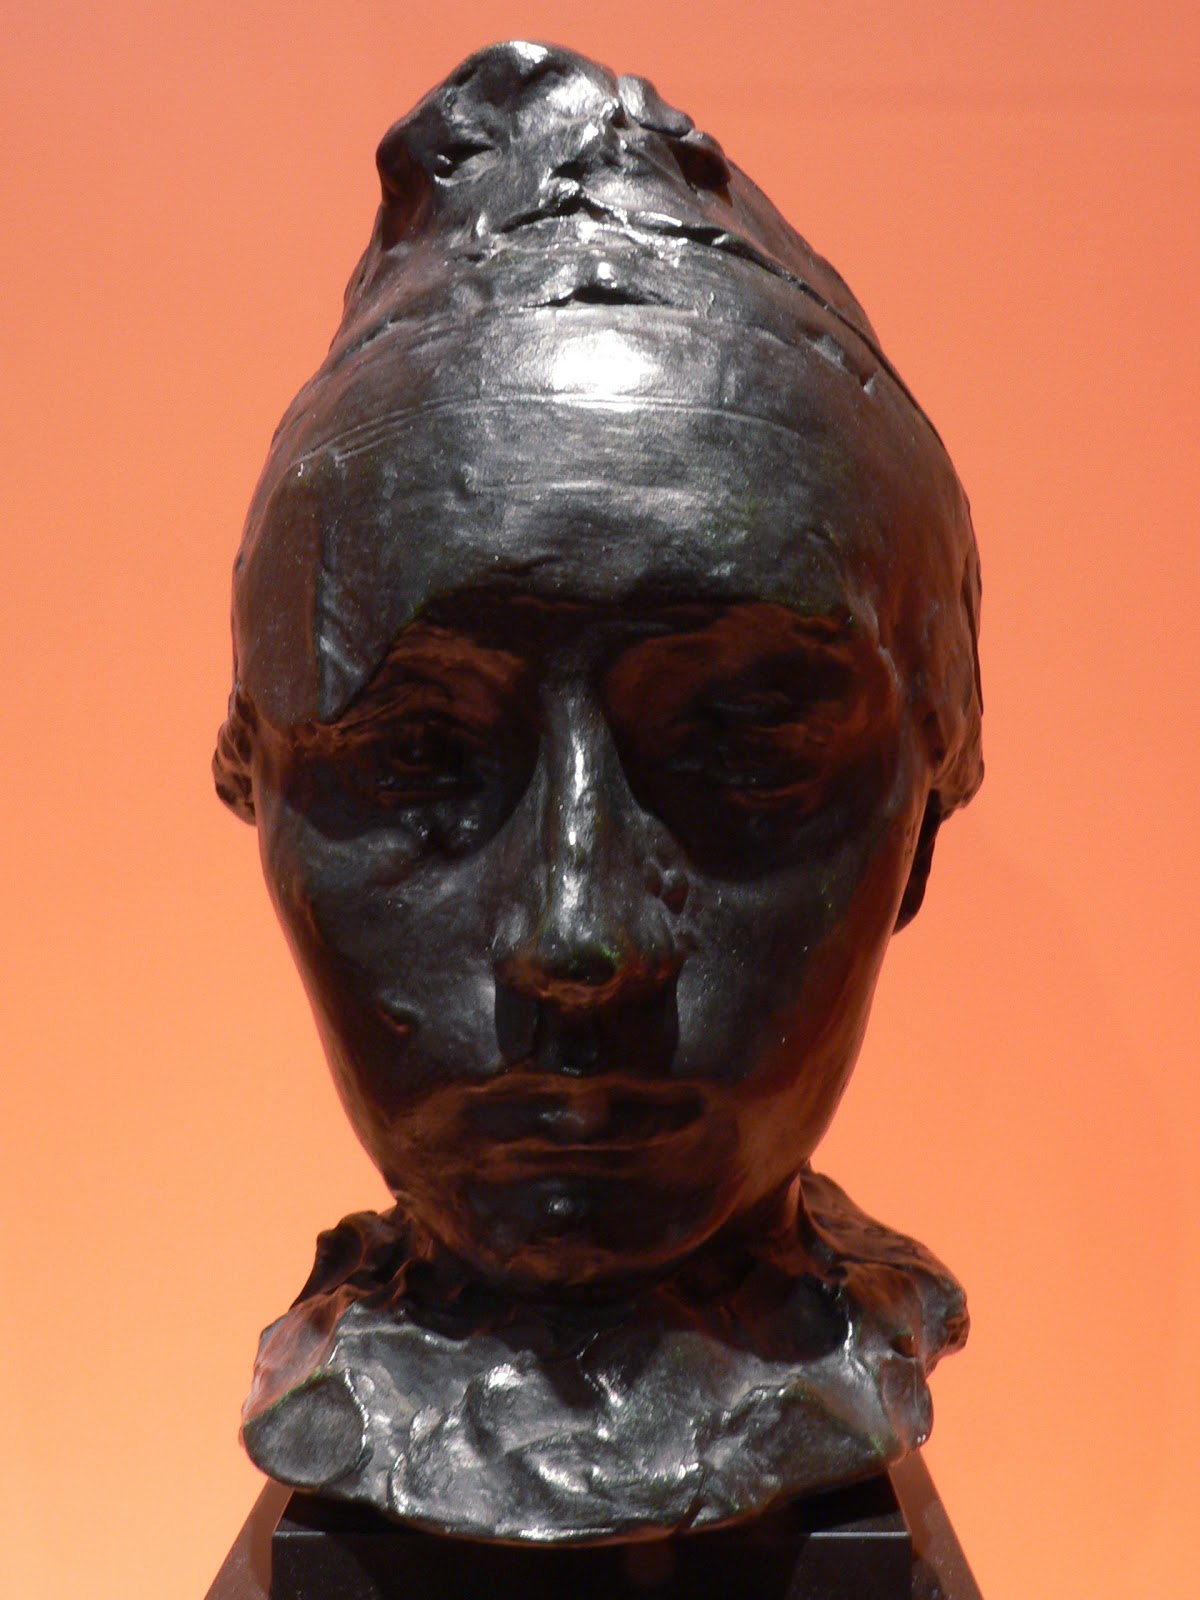 http://upload.wikimedia.org/wikipedia/commons/1/12/Rodin_p1070087.jpg